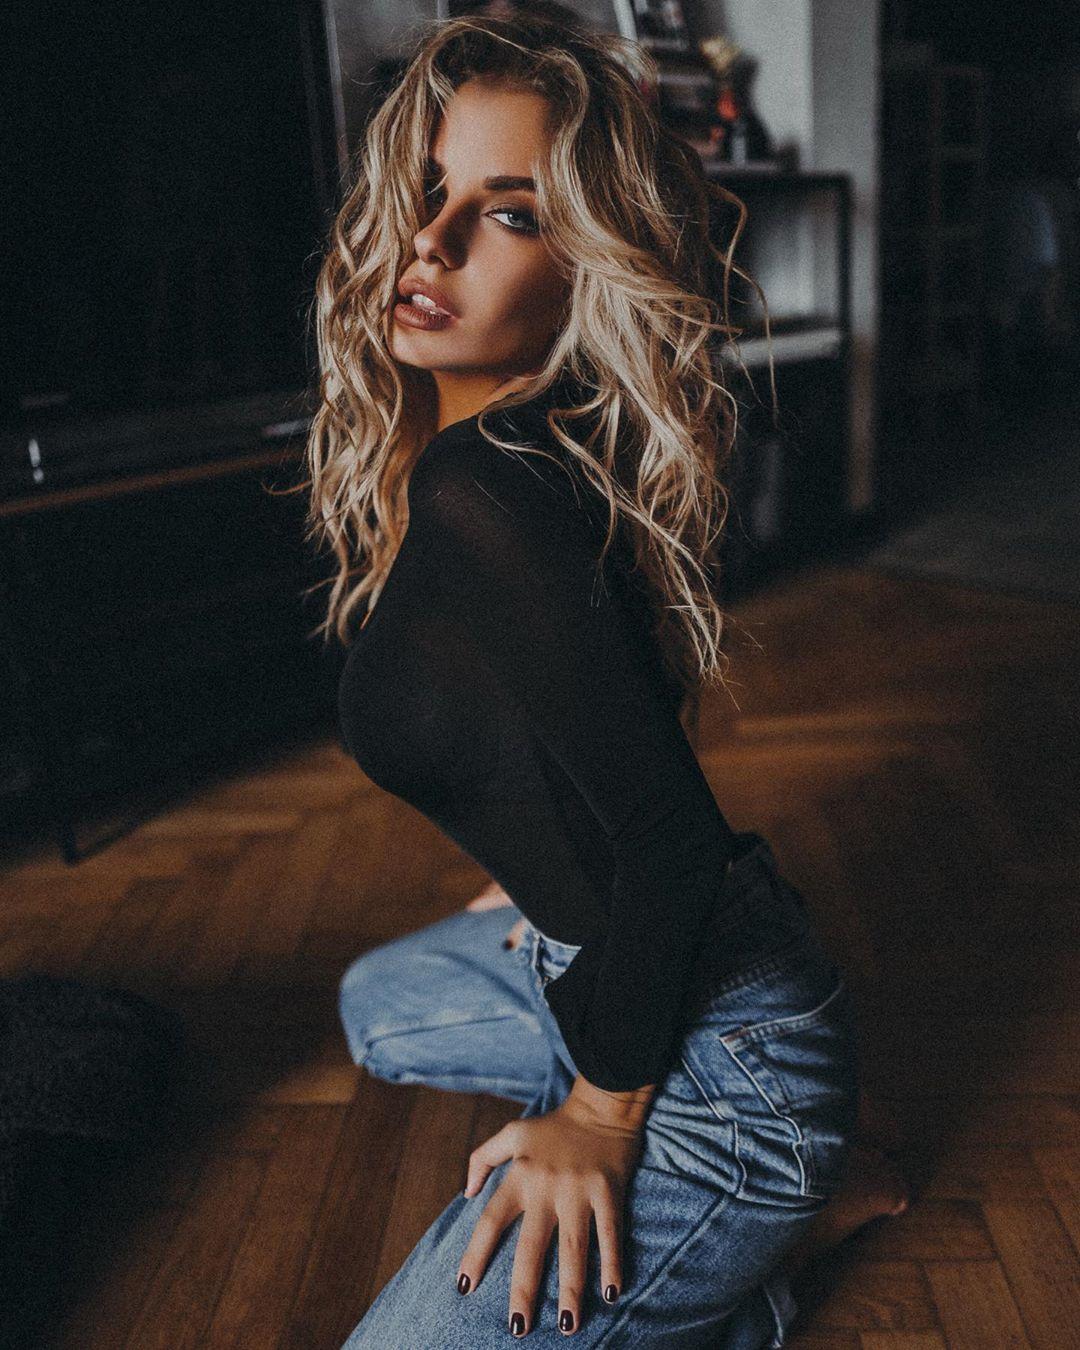 Alexandra-Burimova-Wallpapers-Insta-Fit-BIo-9